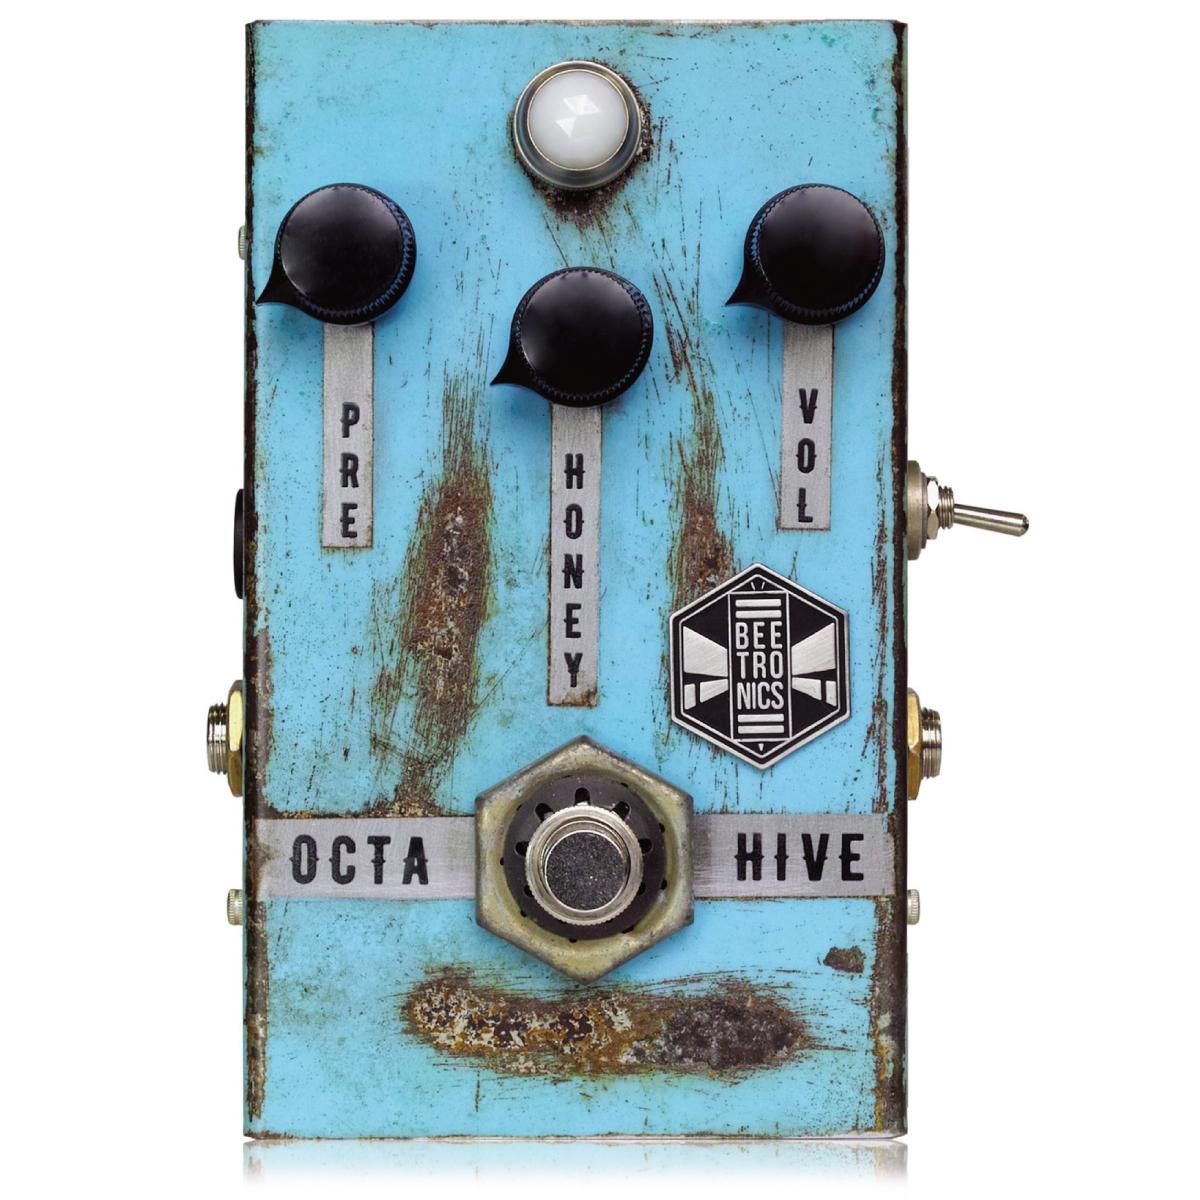 Beetronics OCTAHIVE [動画あり] ビートロニクス オクターブ ファズ ギター エフェクター オクタヴィア を再現